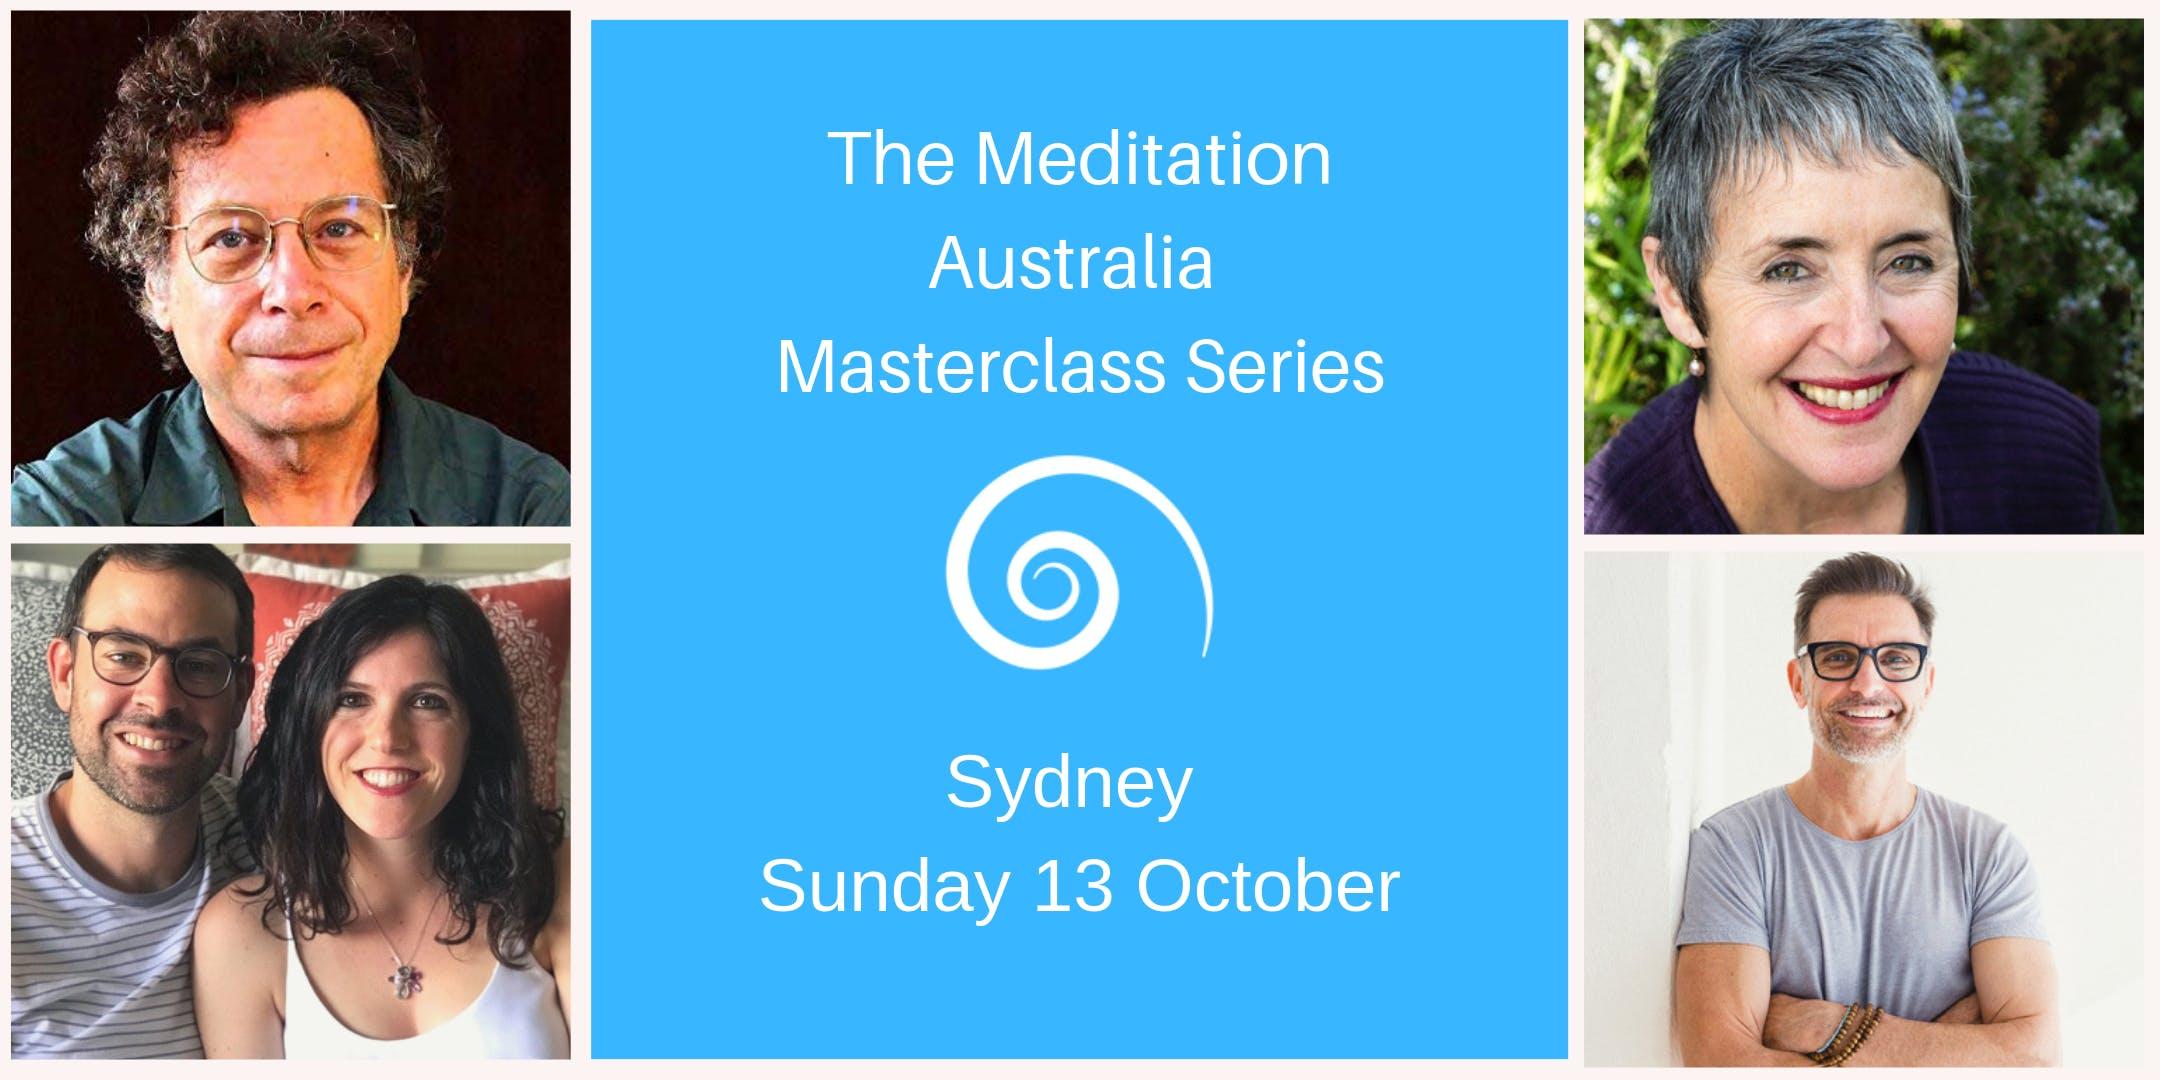 The Meditation Australia Masterclass Series Sydney Sunday 13 October